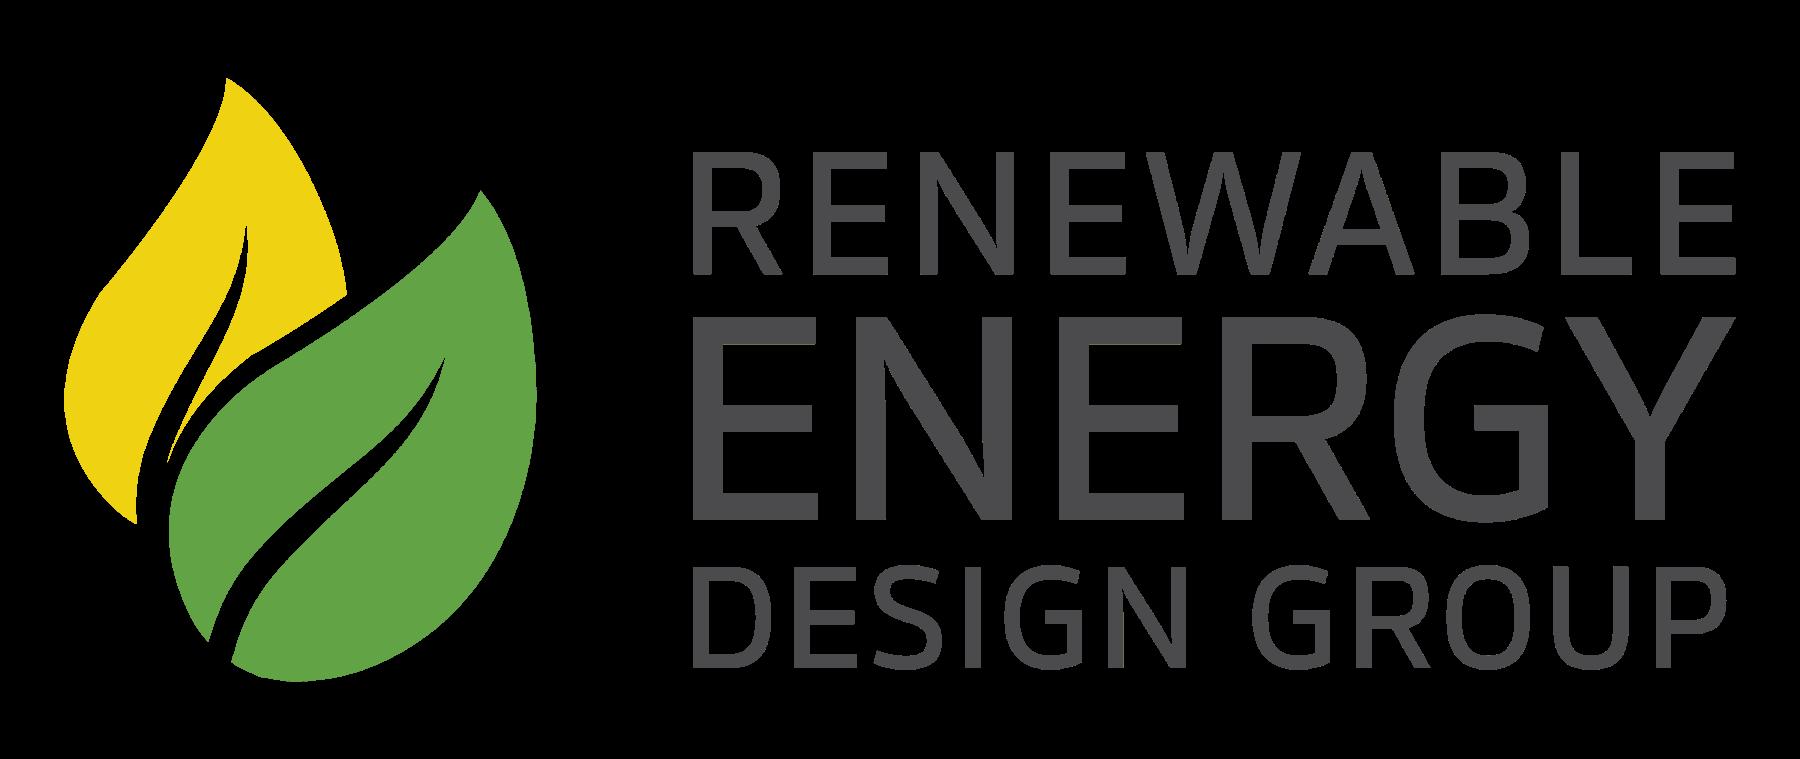 Renewable Energy Design Group - solar panel installation